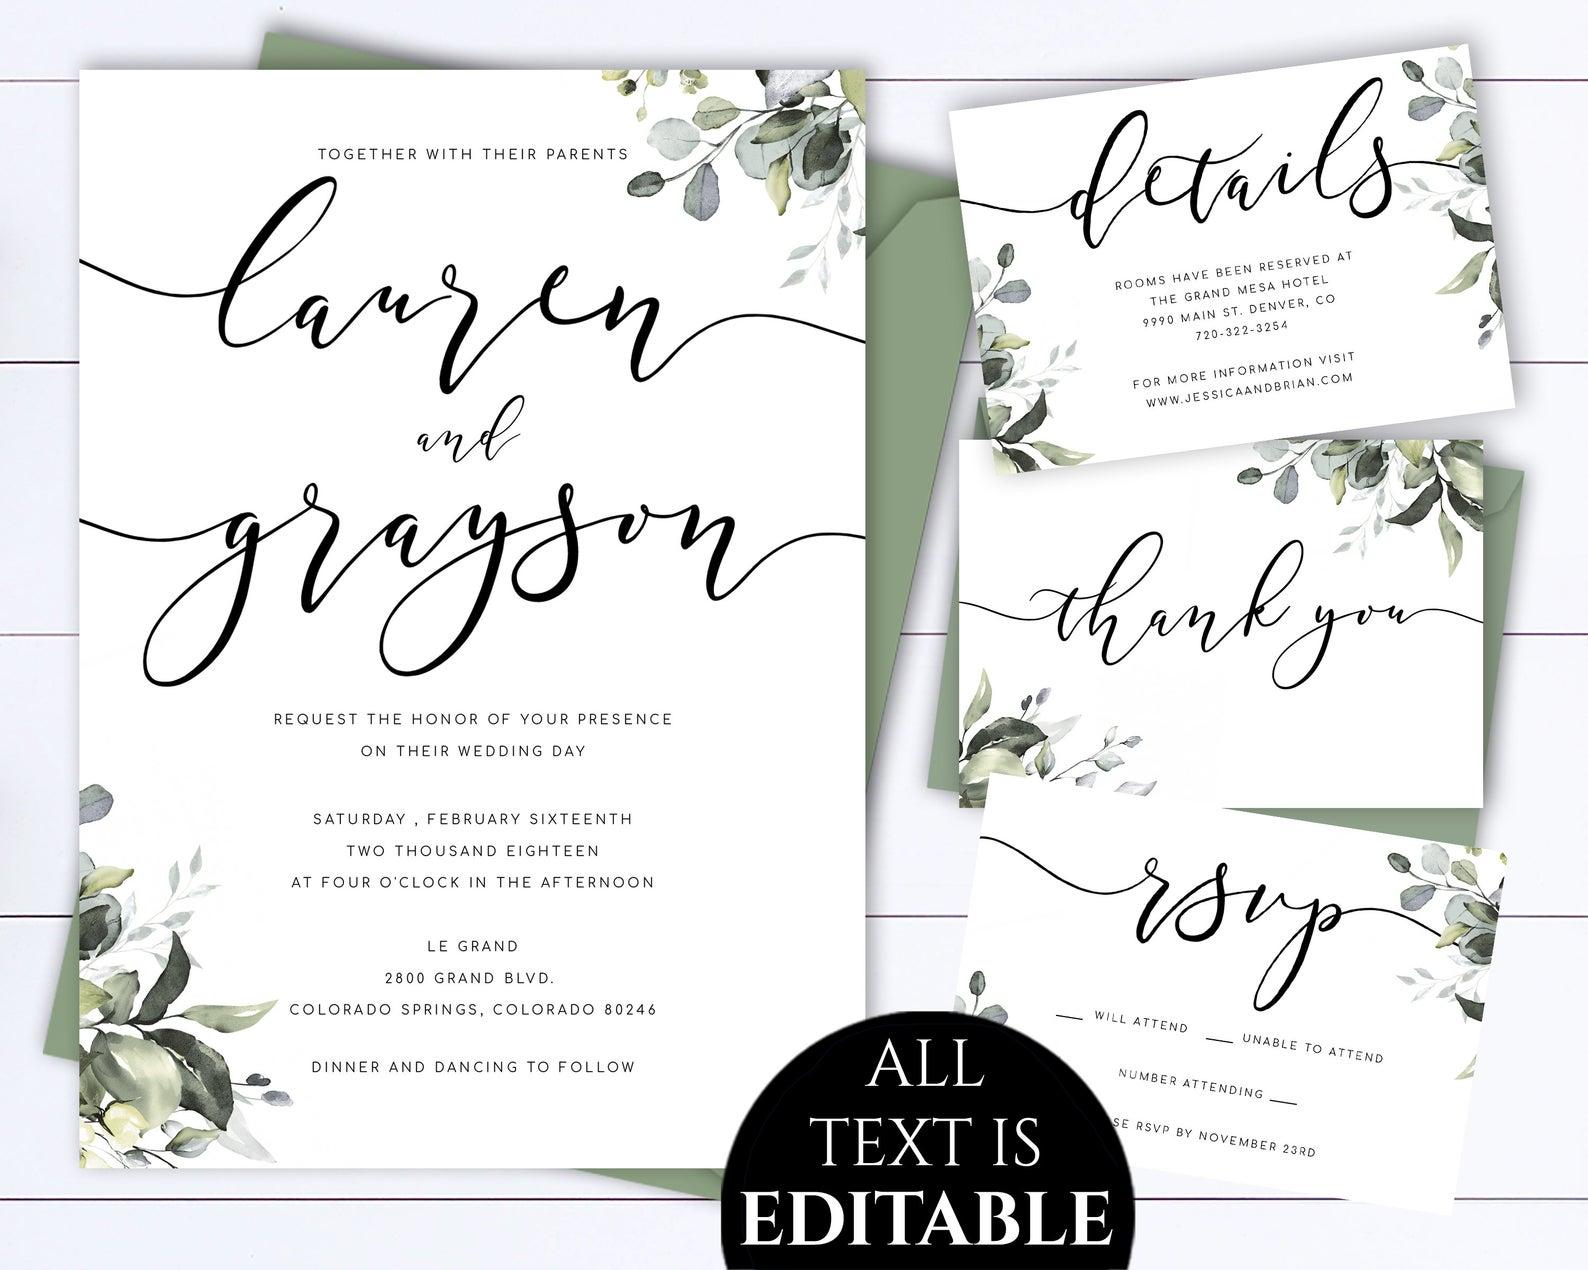 minted memories wedding invitations